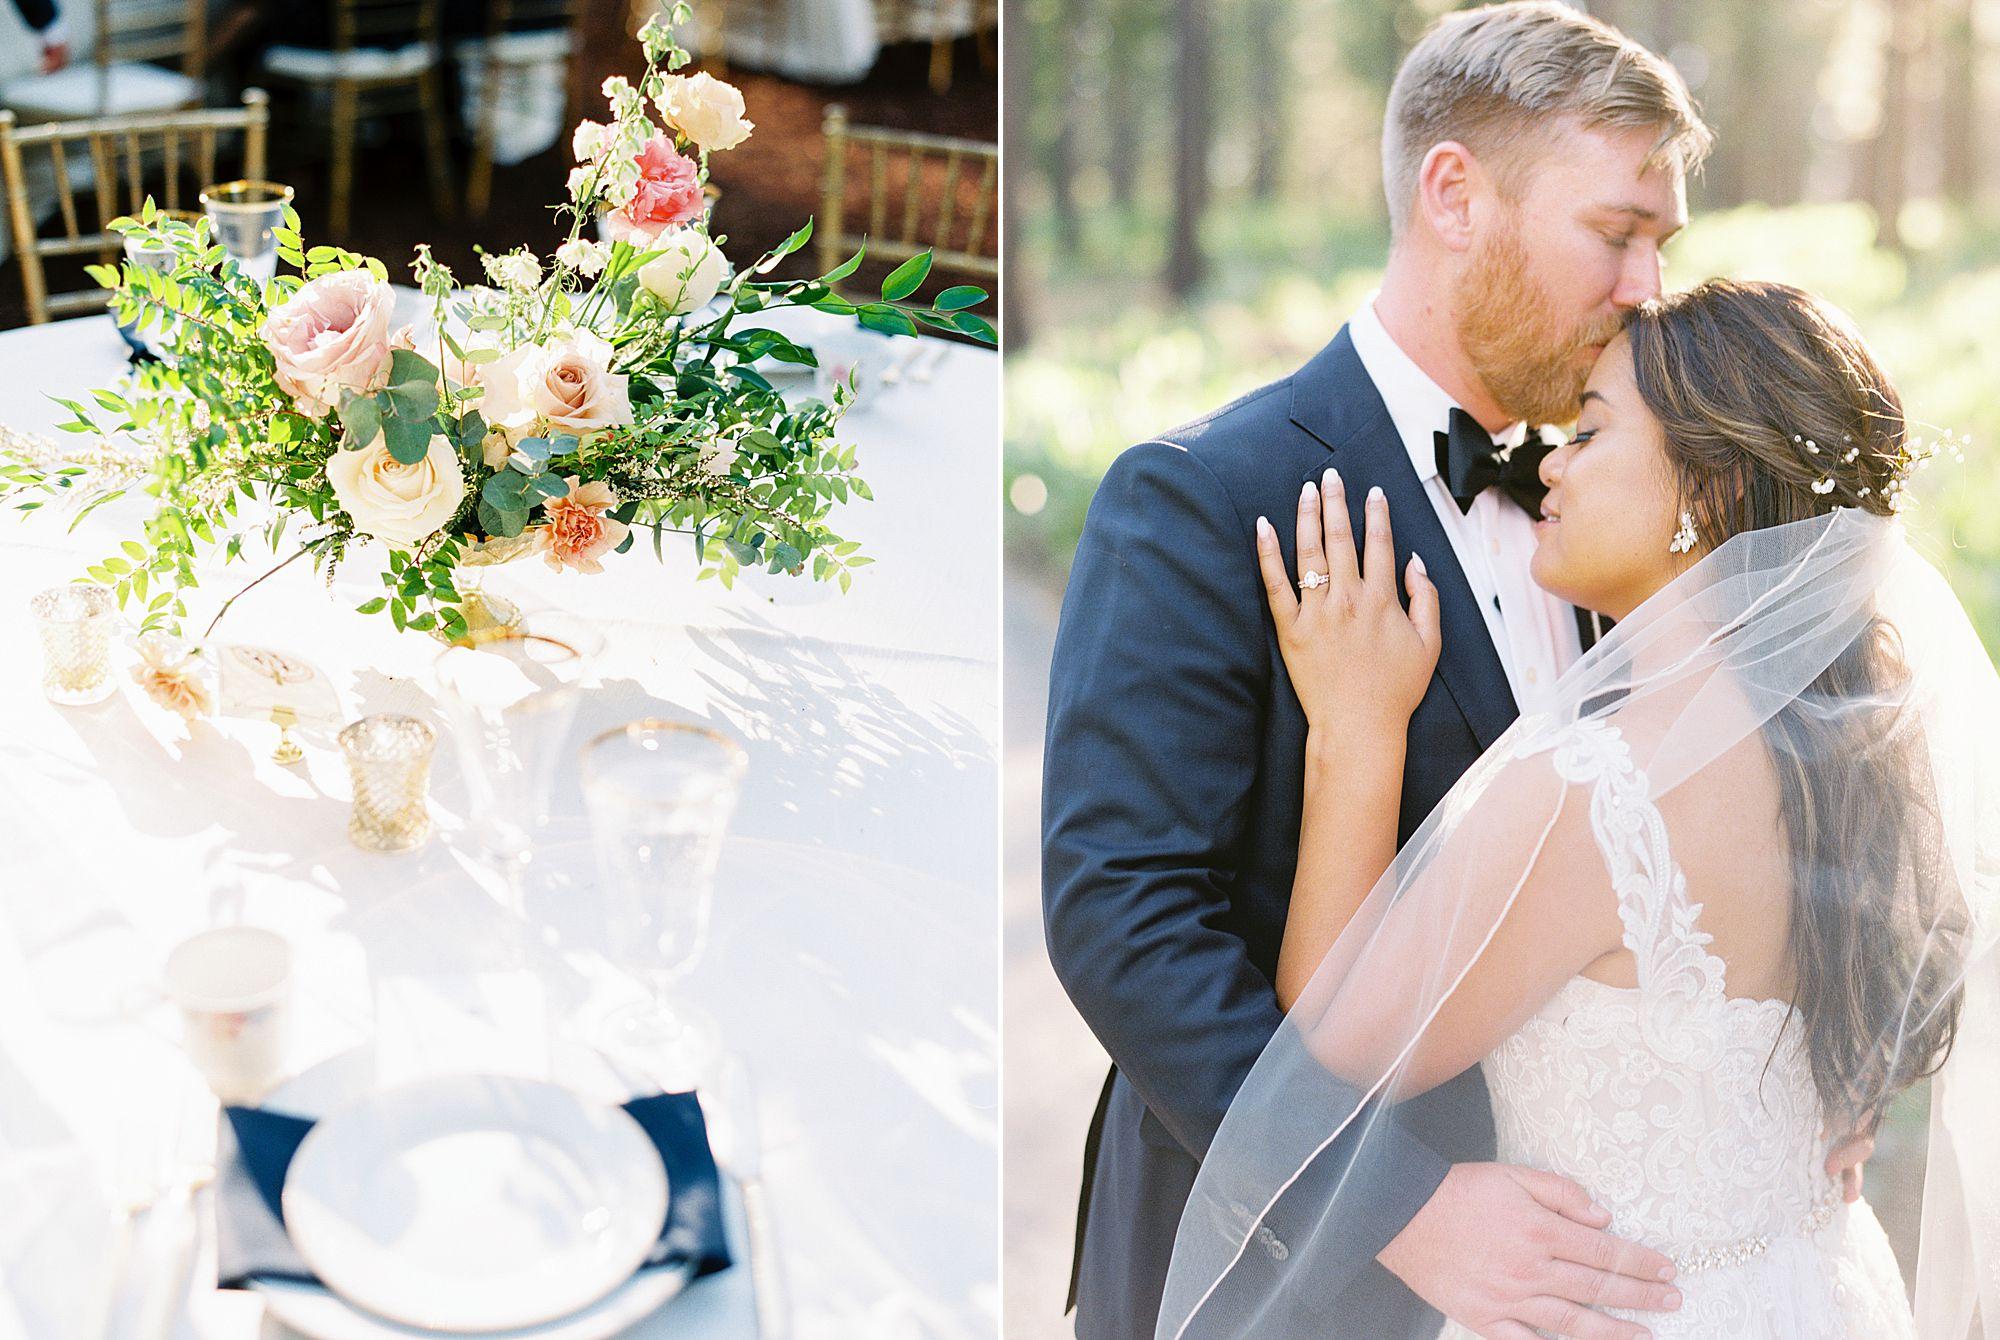 MITCHELLS MOUNTAIN MEADOWS Wedding - Ash Baumgartner - Phallina and Matt - Sierraville Wedding - Tahoe Wedding Photography_0022.jpg